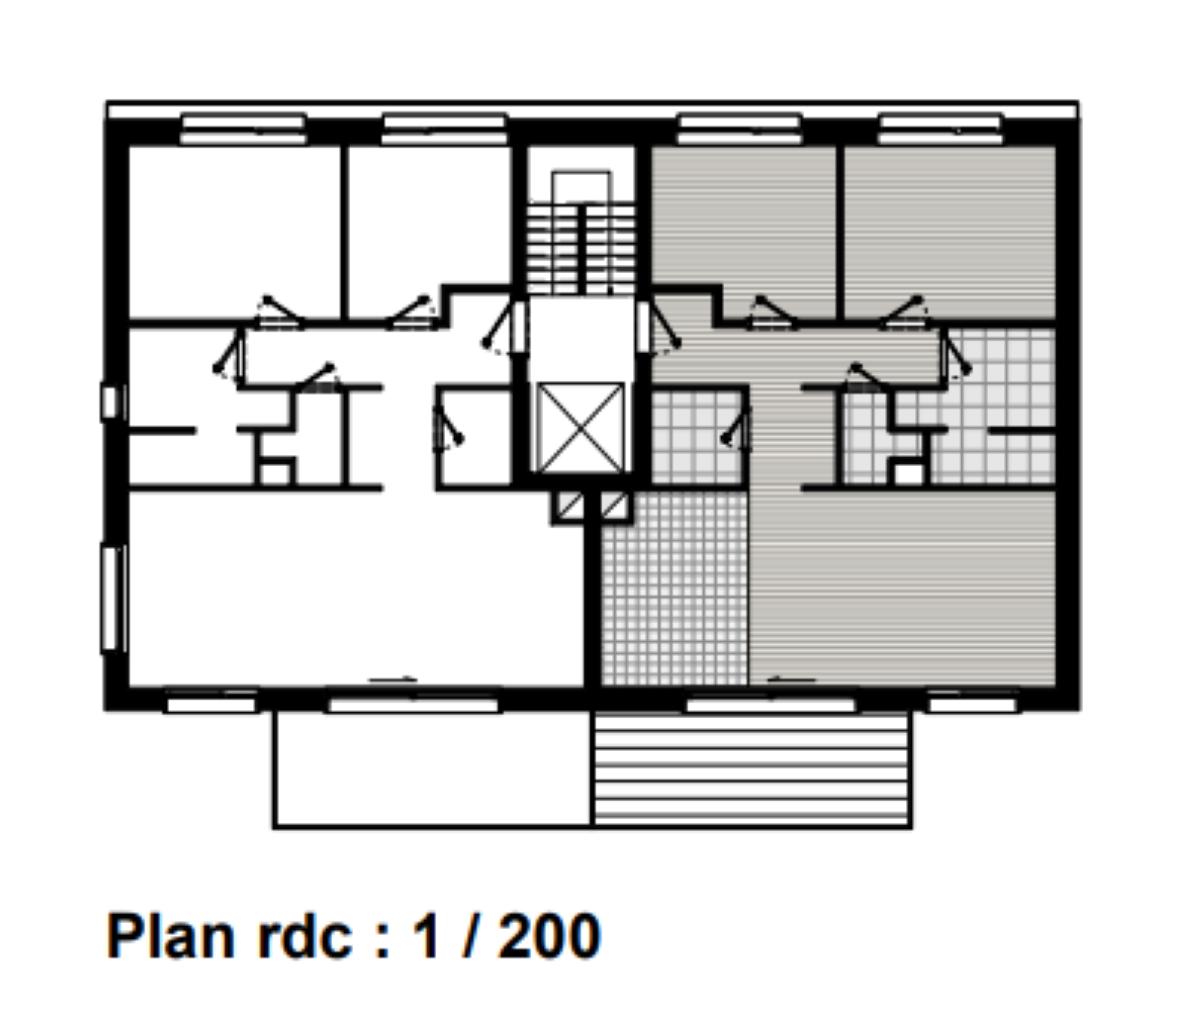 Appartement - Rebecq Quenast - #3632750-3